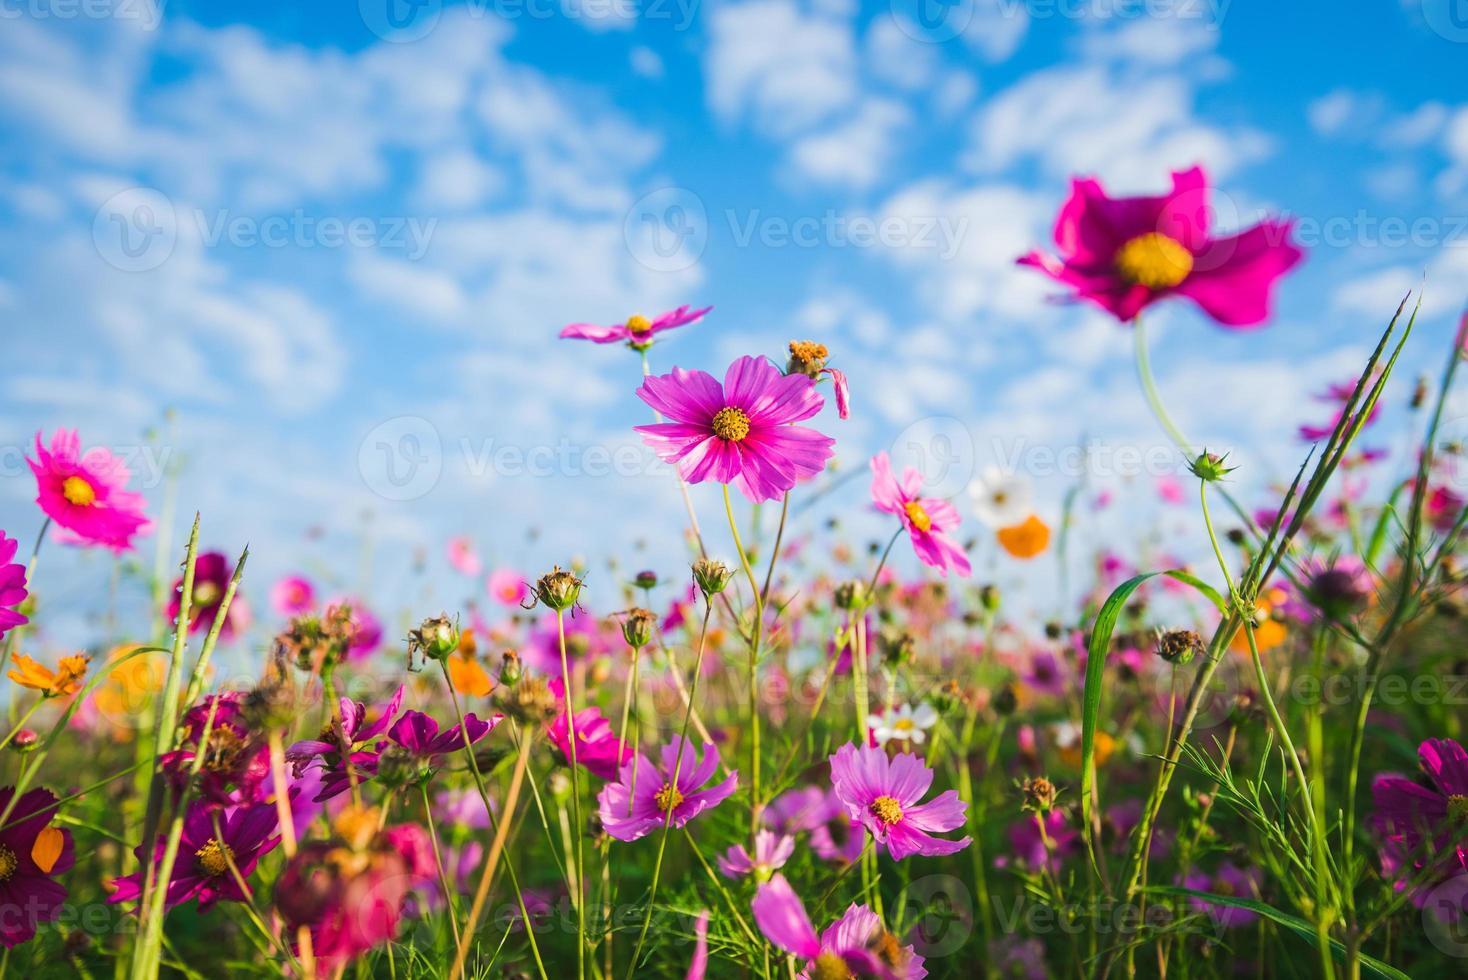 The Cosmos Flower of grassland photo